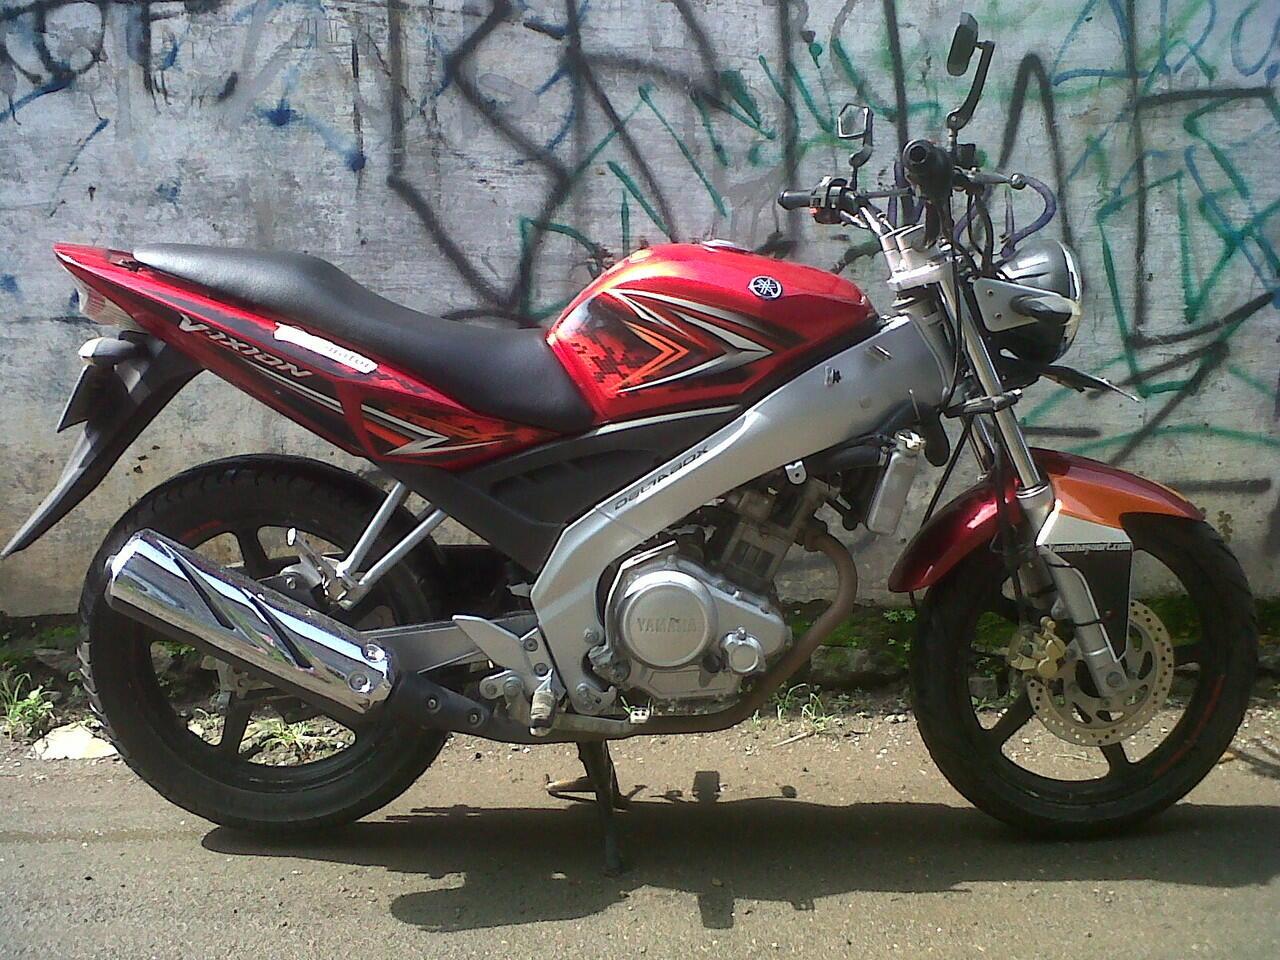 Cari Yamaha Vixion MODIF SIMPLE STREET FIGHTER 2007 Mesin Bagus